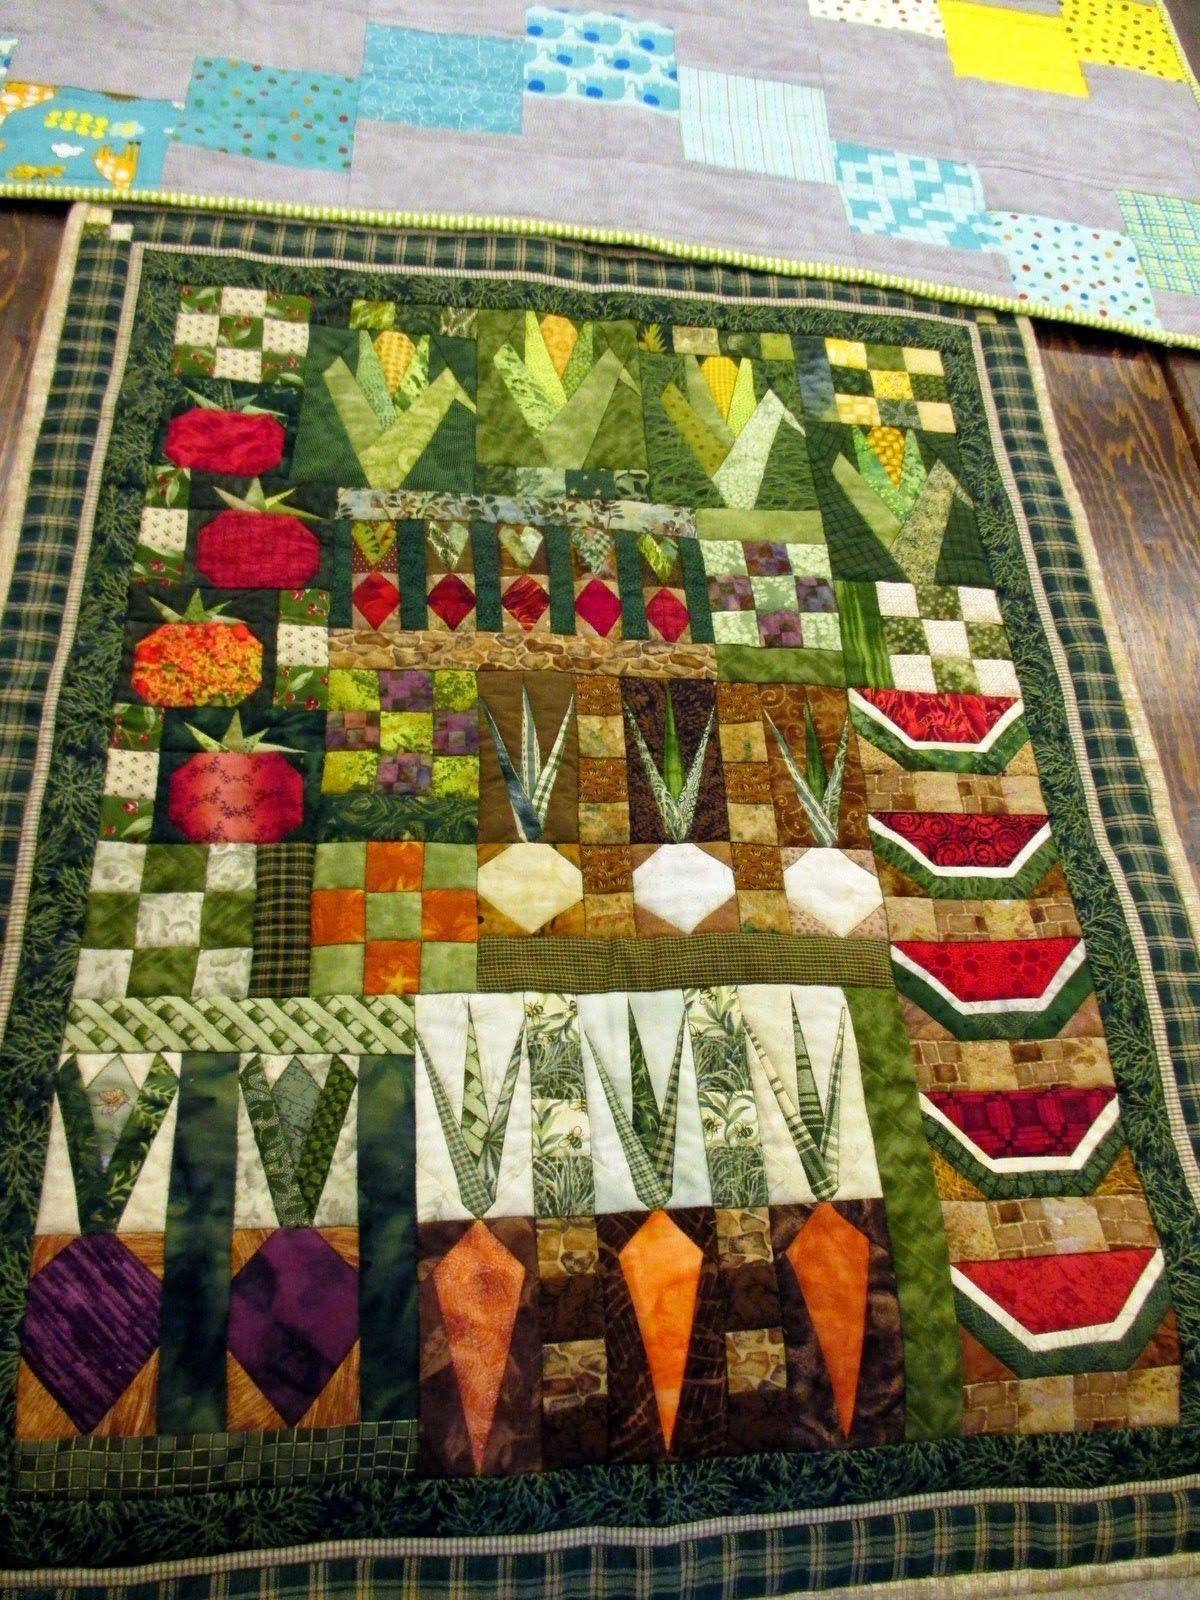 Veggie Quilt Garden Patch Pattern Featured In Quiltmaker May